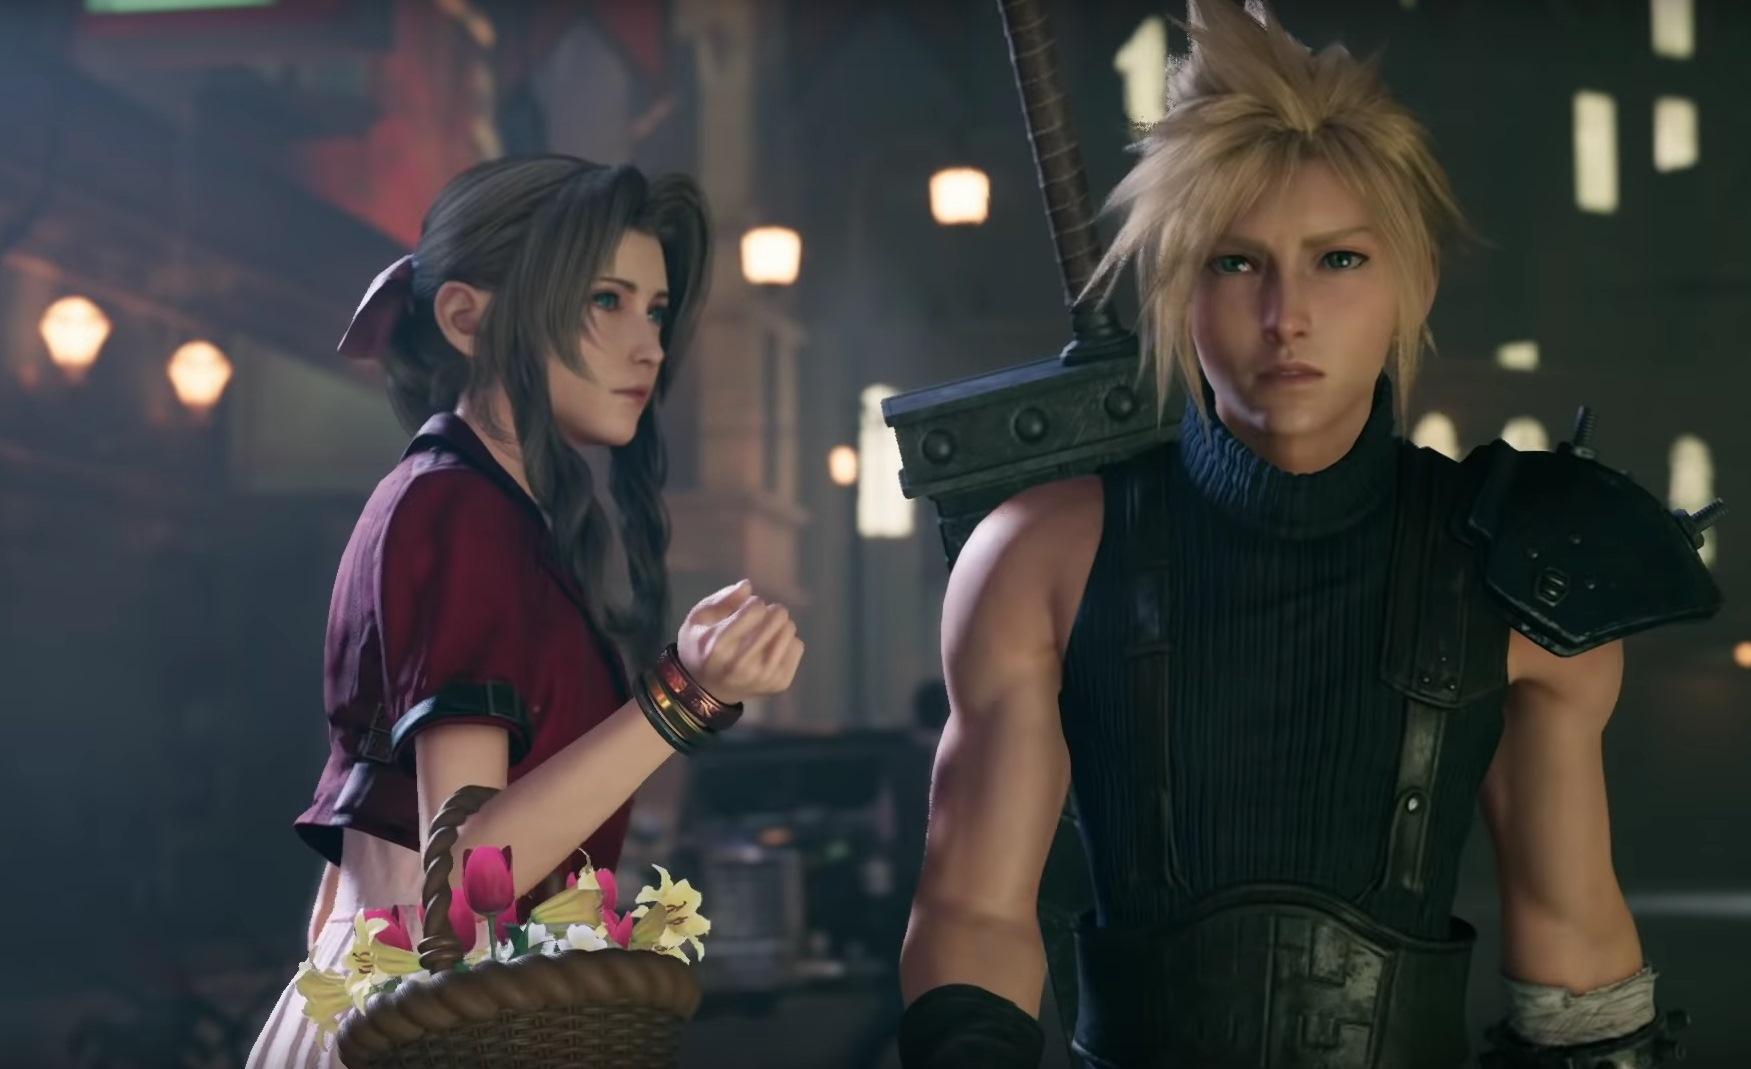 Final Fantasy Xv Art Teaser